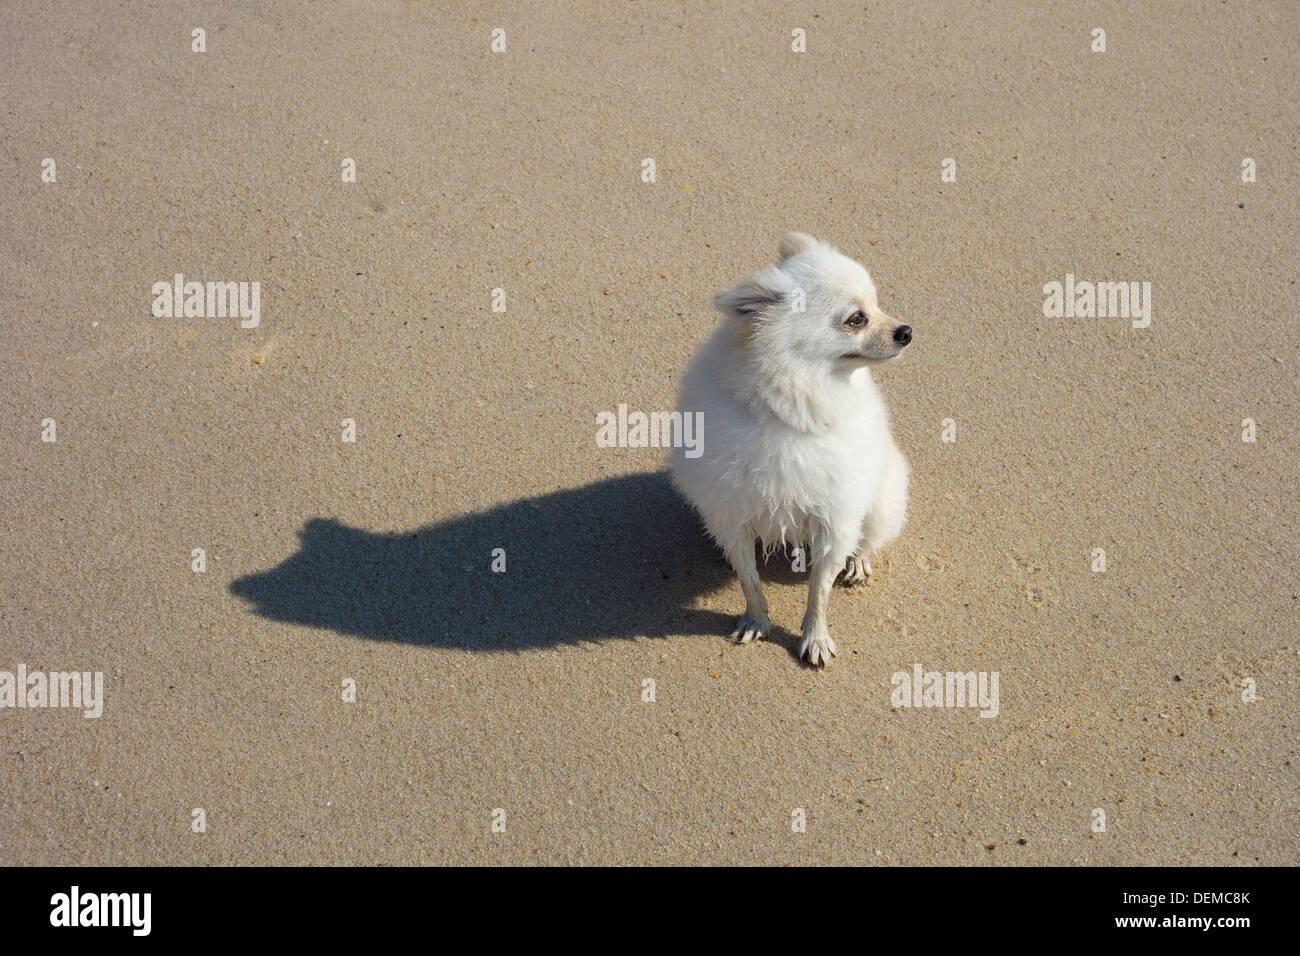 Small White Pomeranian Dog At The Beach Stock Photo 60684979 Alamy